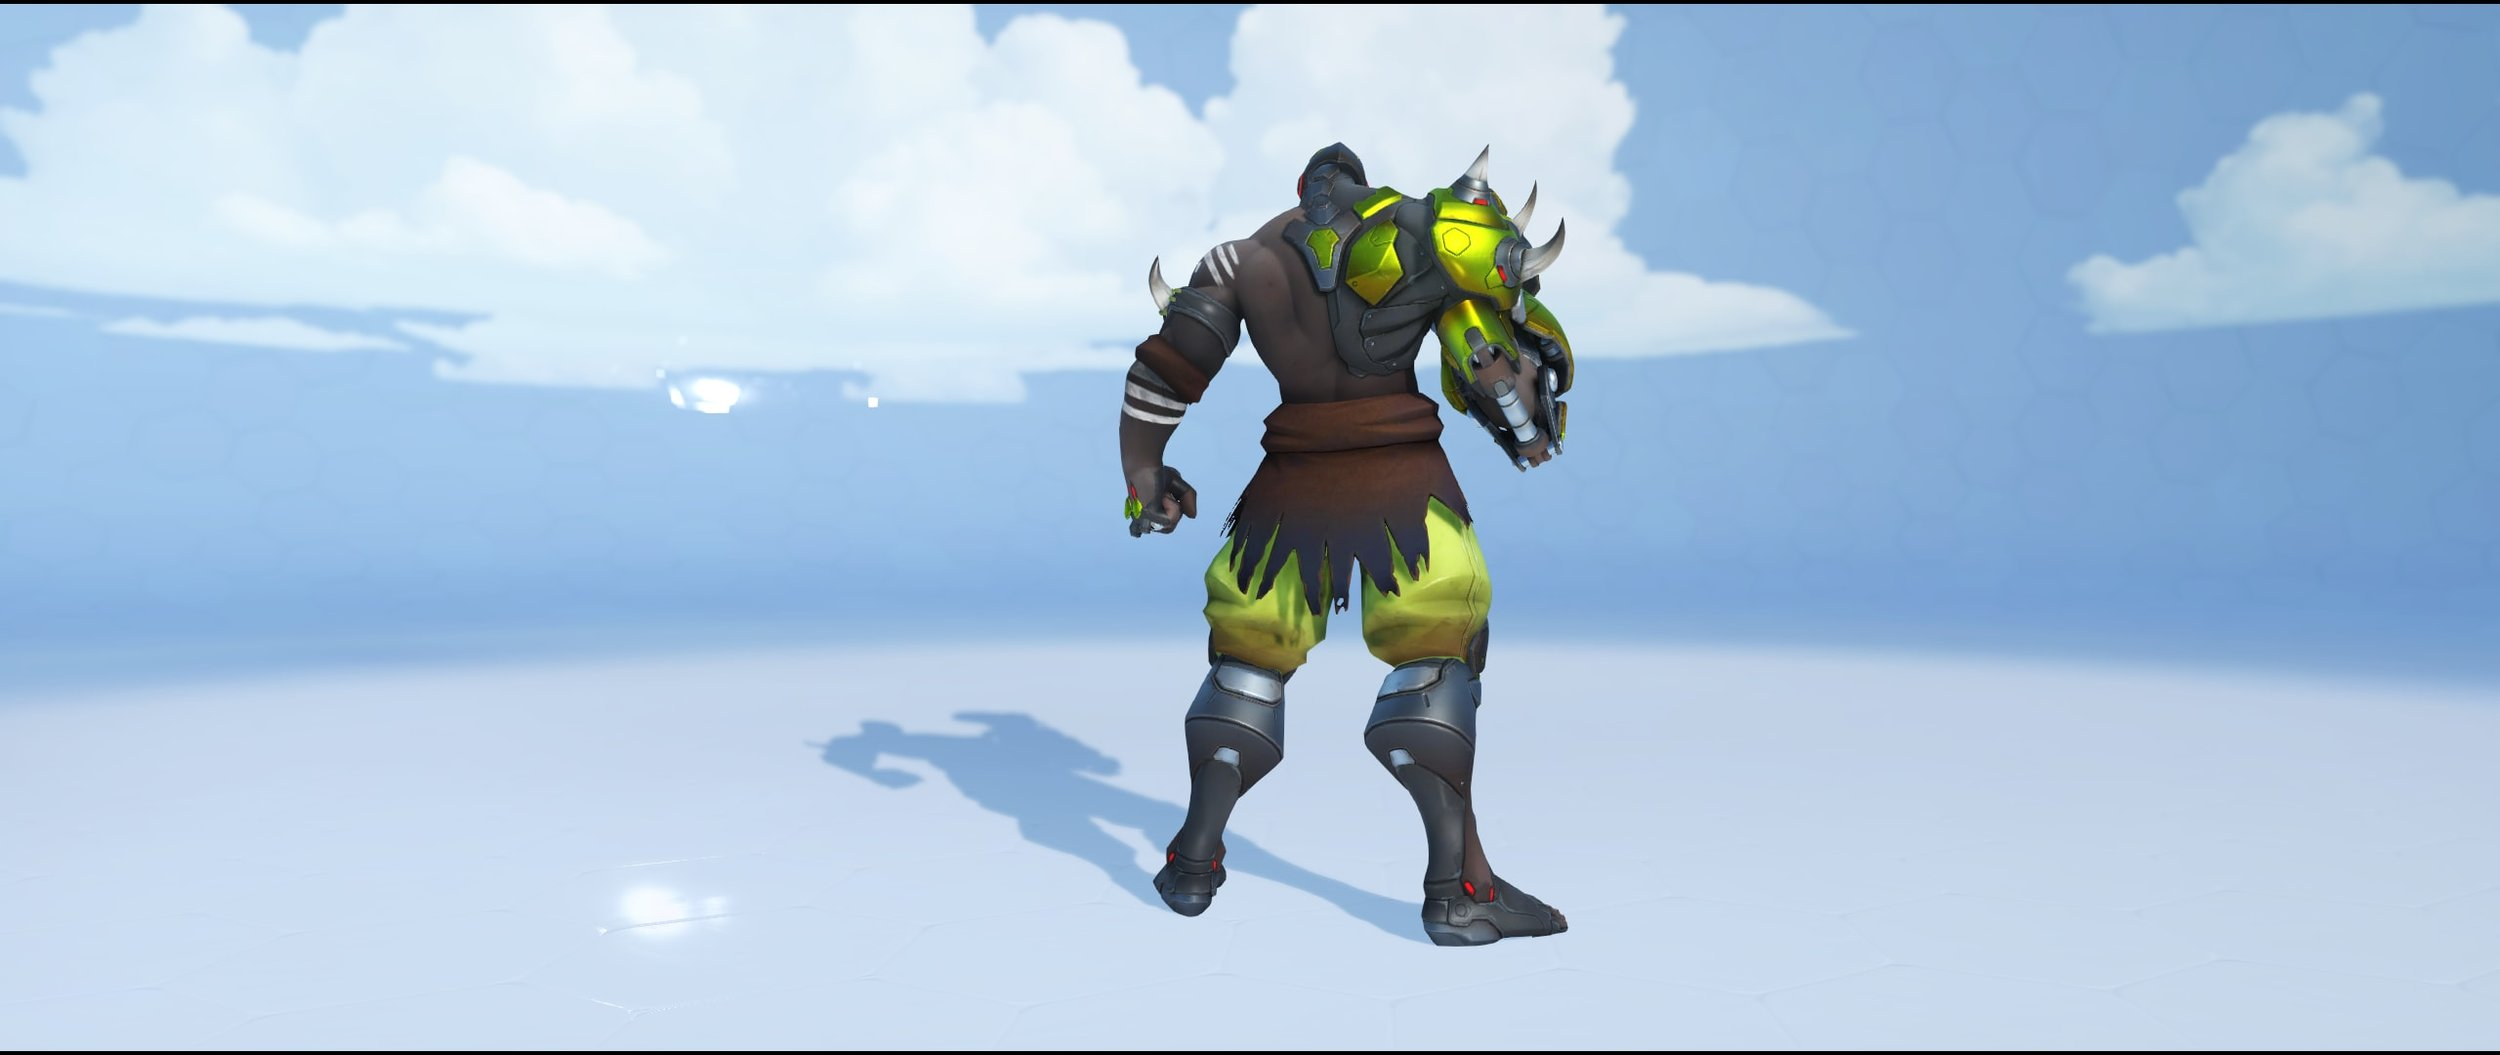 Plains back rare skin Doomfist Overwatch.jpg